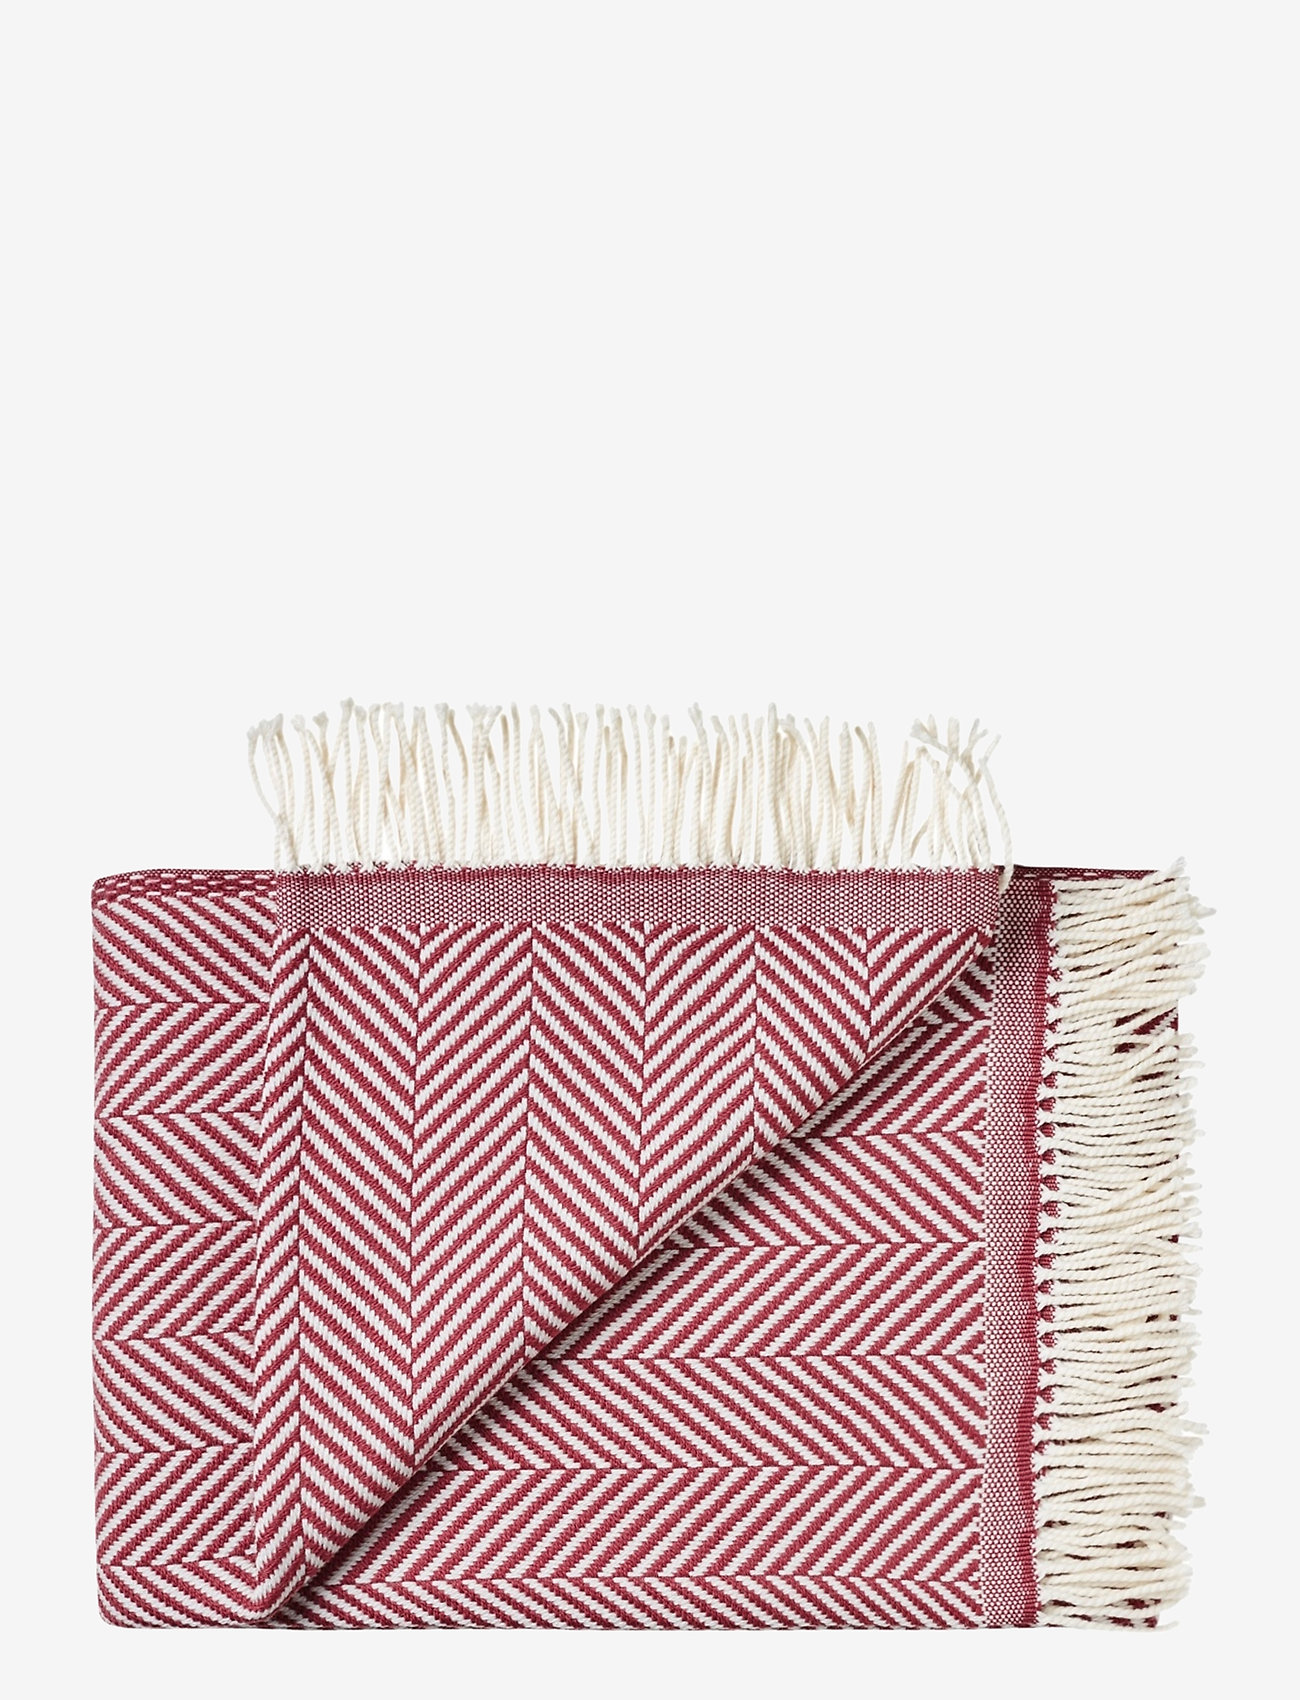 Silkeborg Uldspinderi - Bordeaux 130x190 cm - blankets - 8708 bordeaux - 0